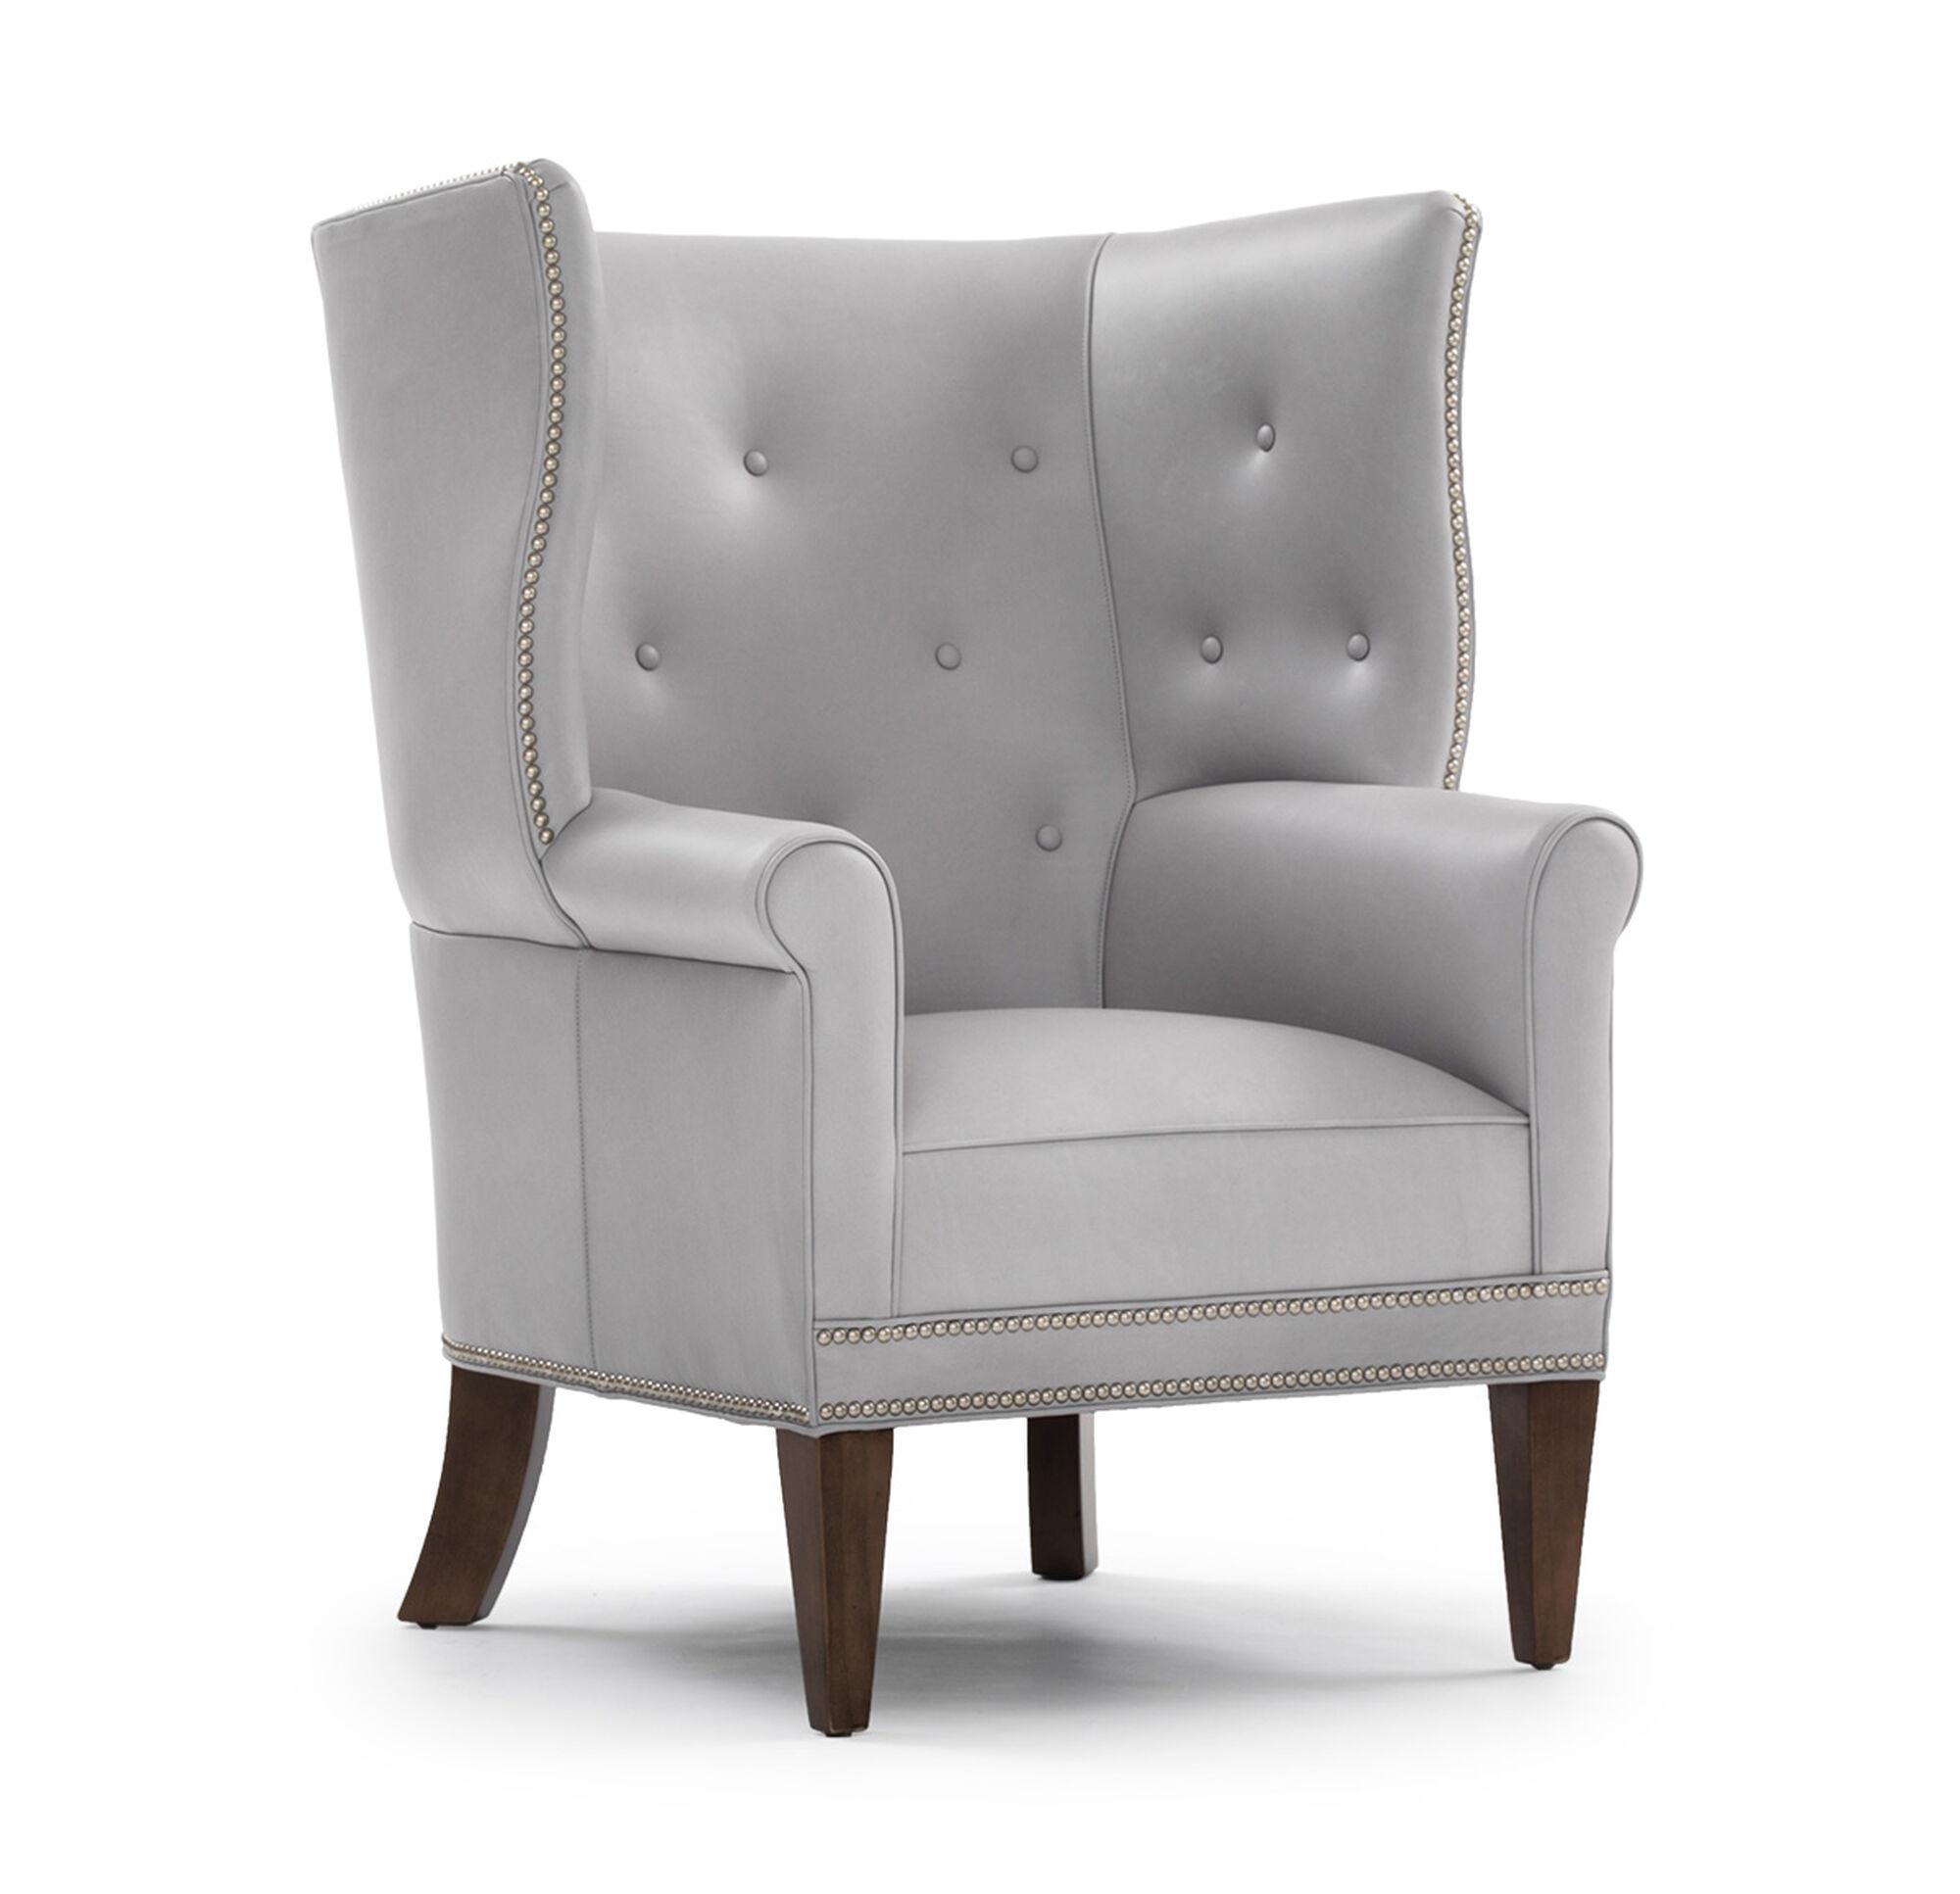 White leather wing chair - White Leather Wing Chair 3